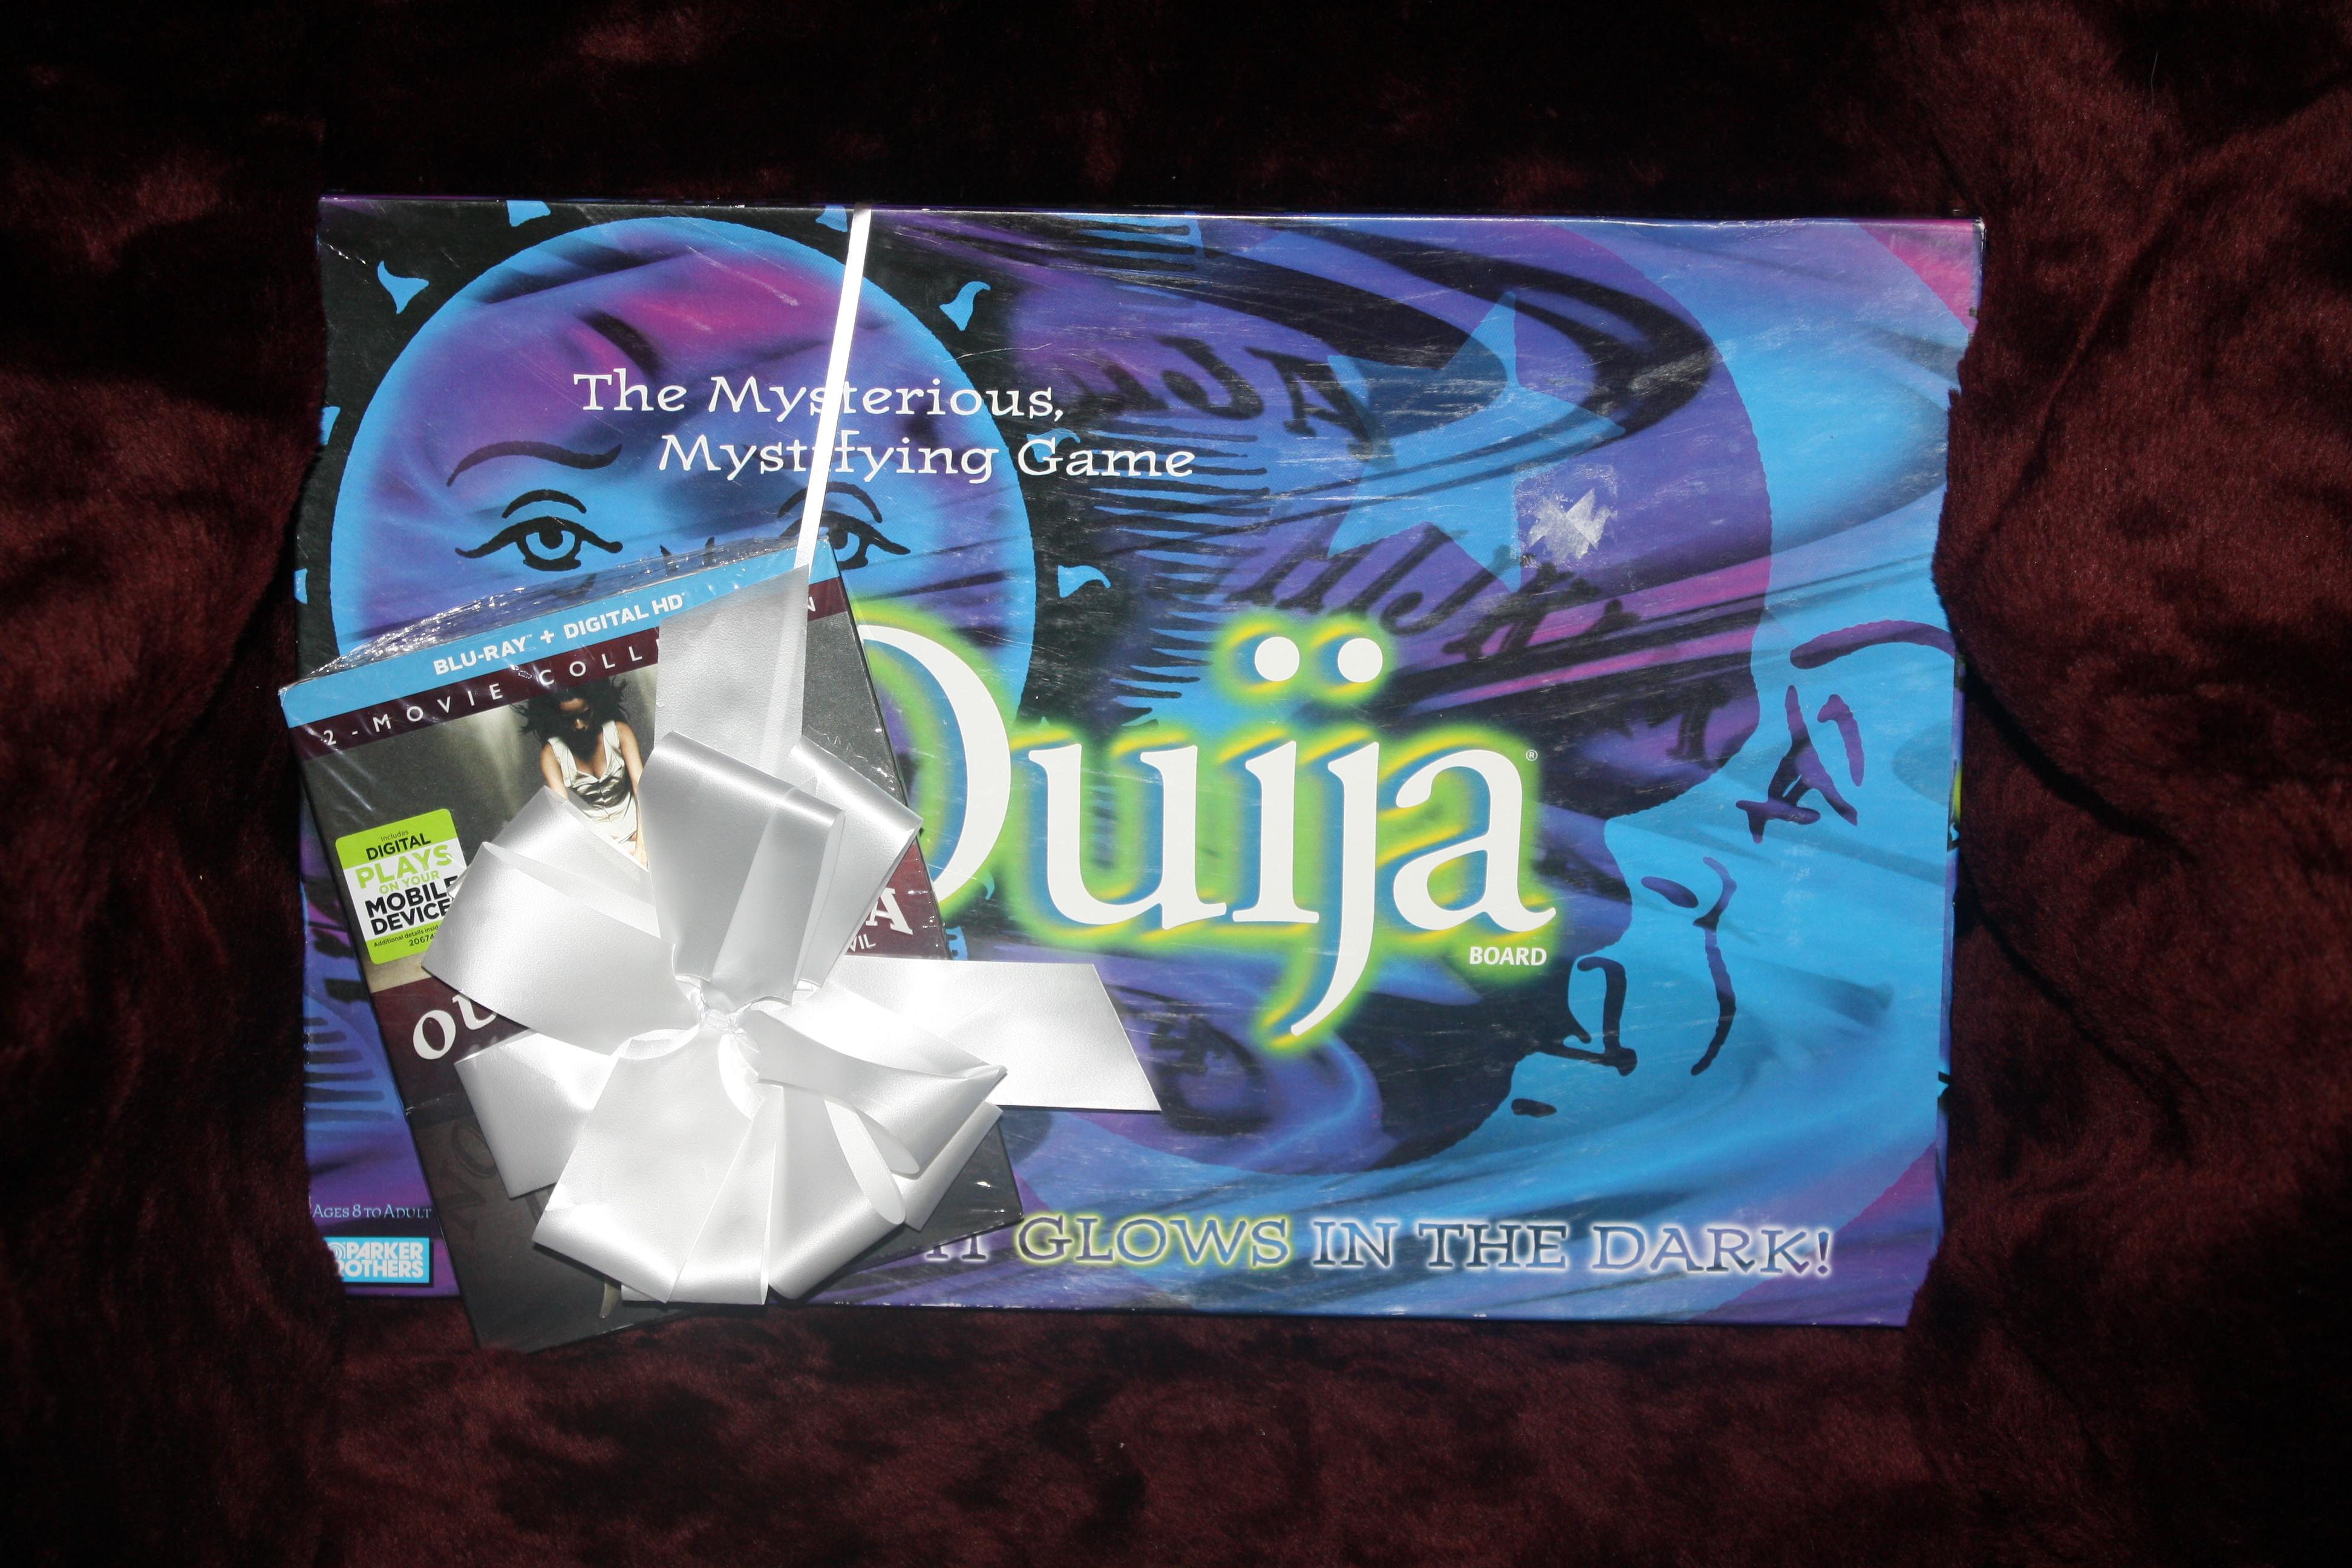 87. Ouija board